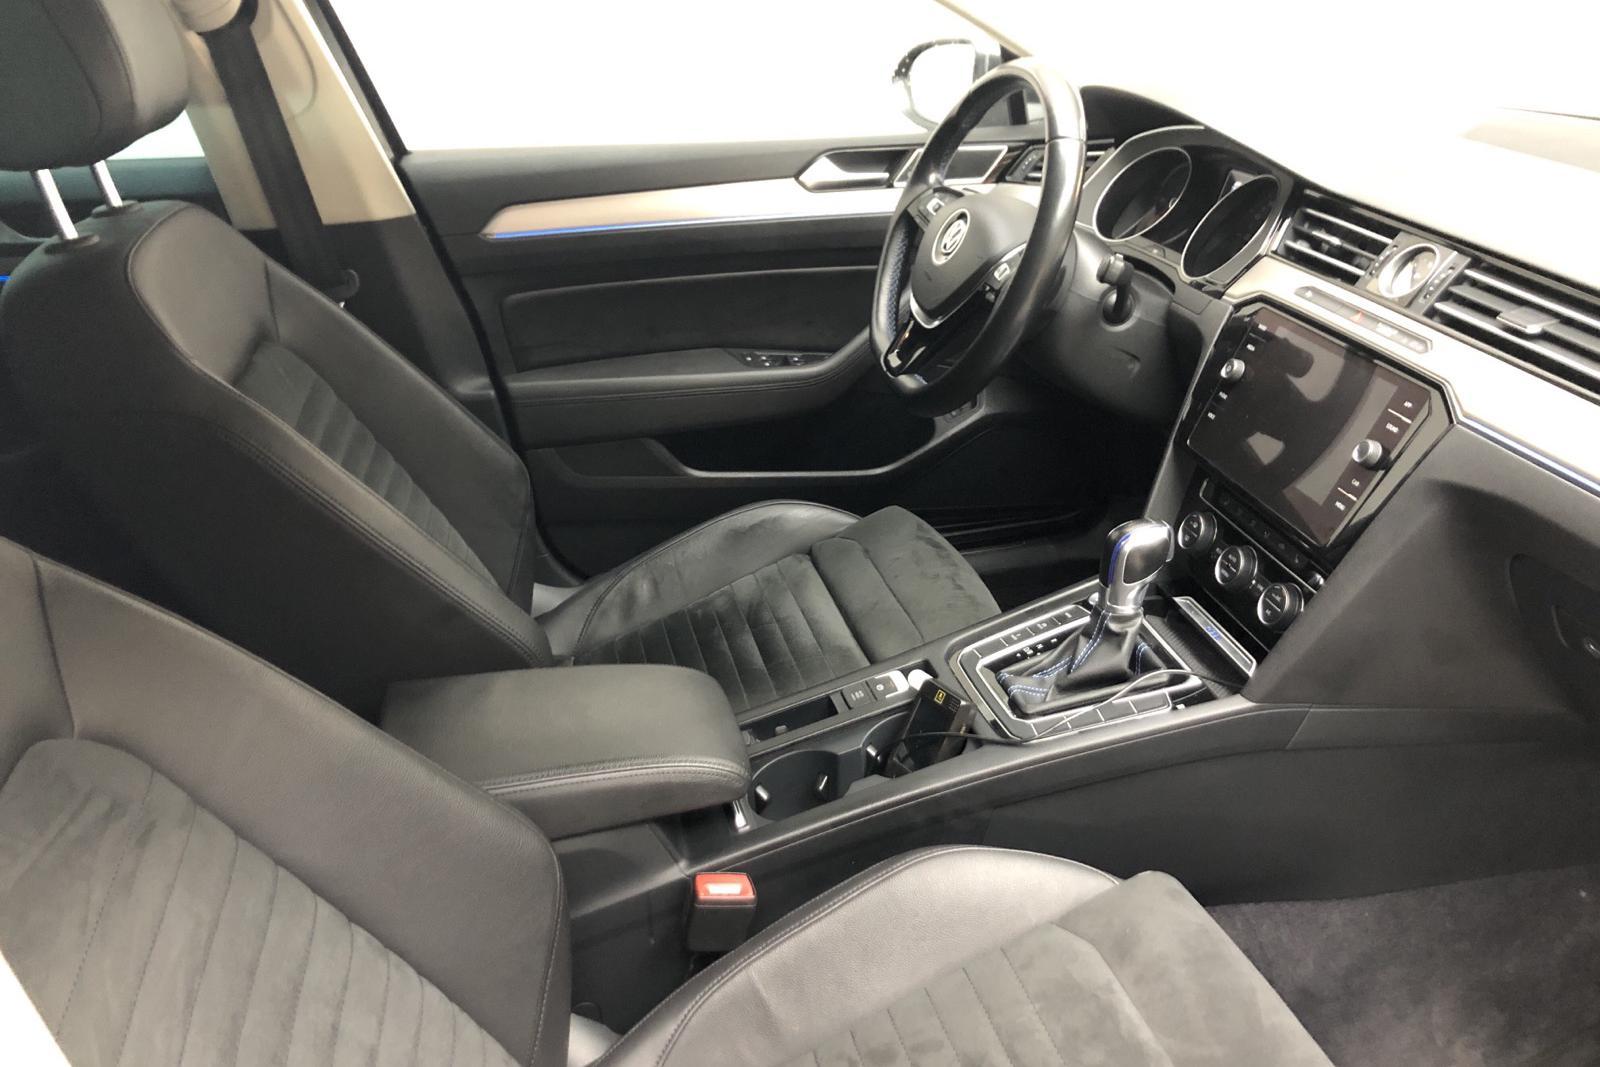 VW Passat 1.4 Plug-in-Hybrid Sportscombi (218hk) - 96 970 km - Automatic - Dark Grey - 2018